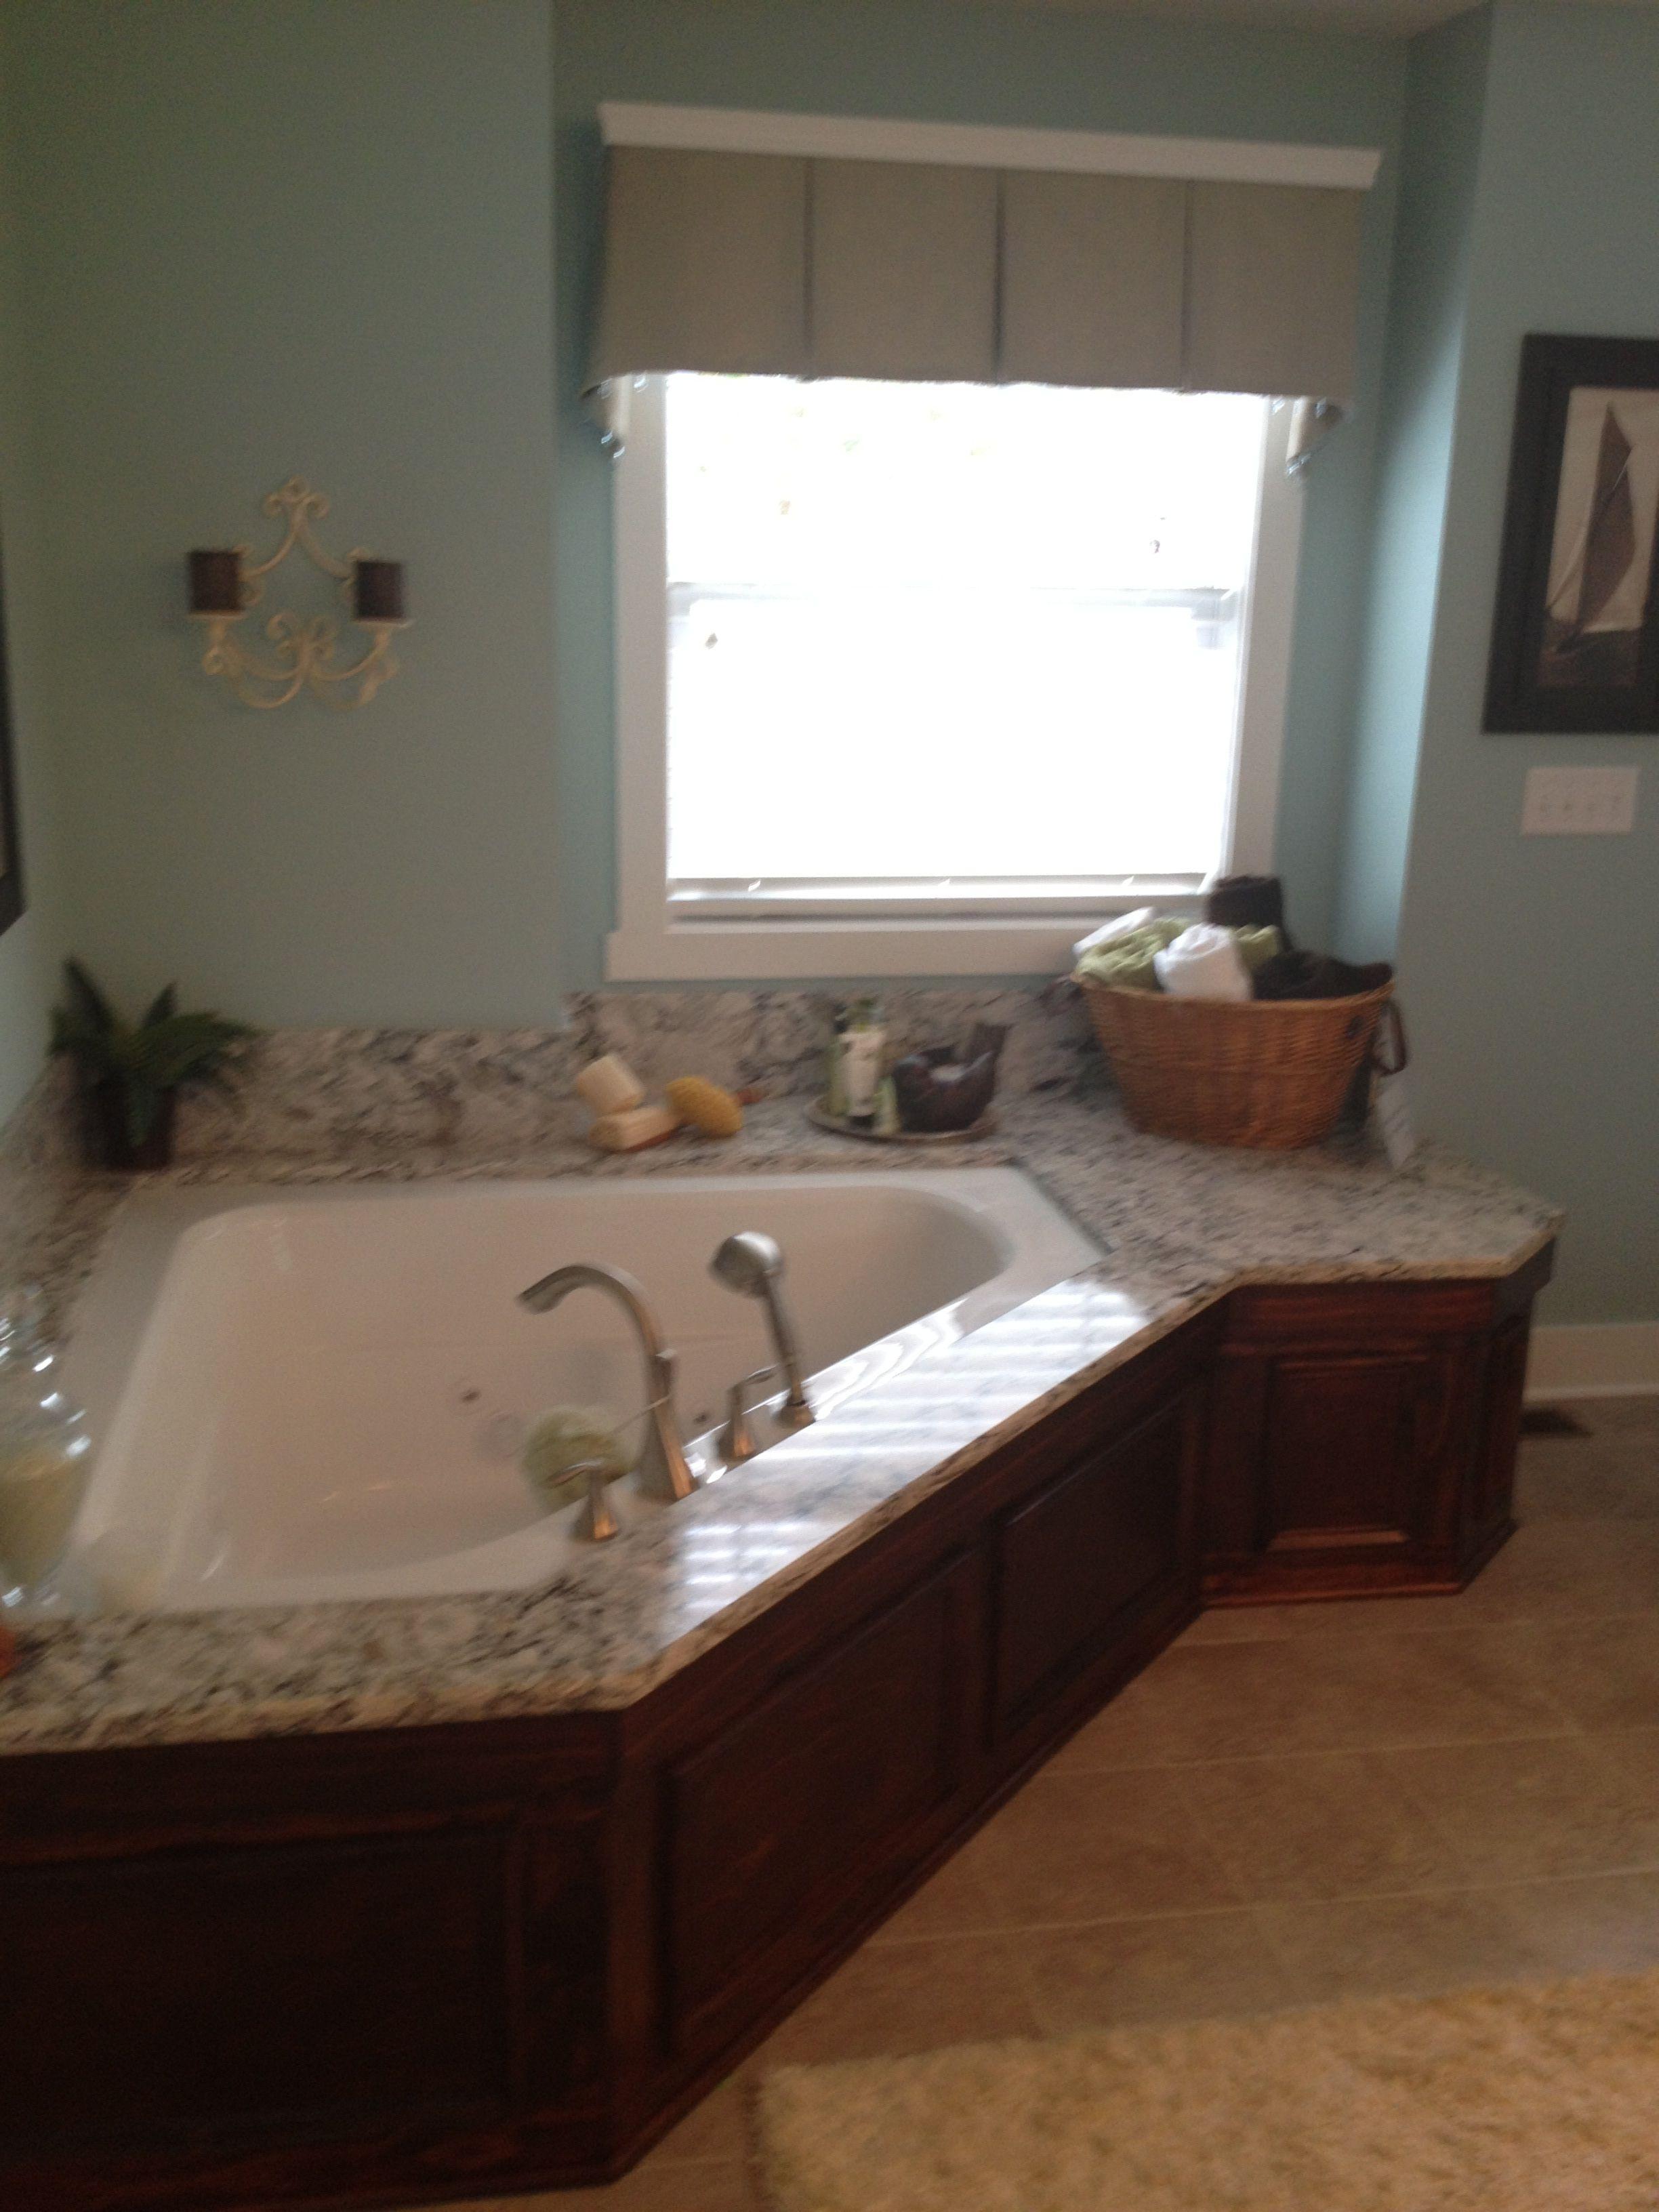 jacuzzi (diagonal to double sink arrangement) | Bathrooms ...